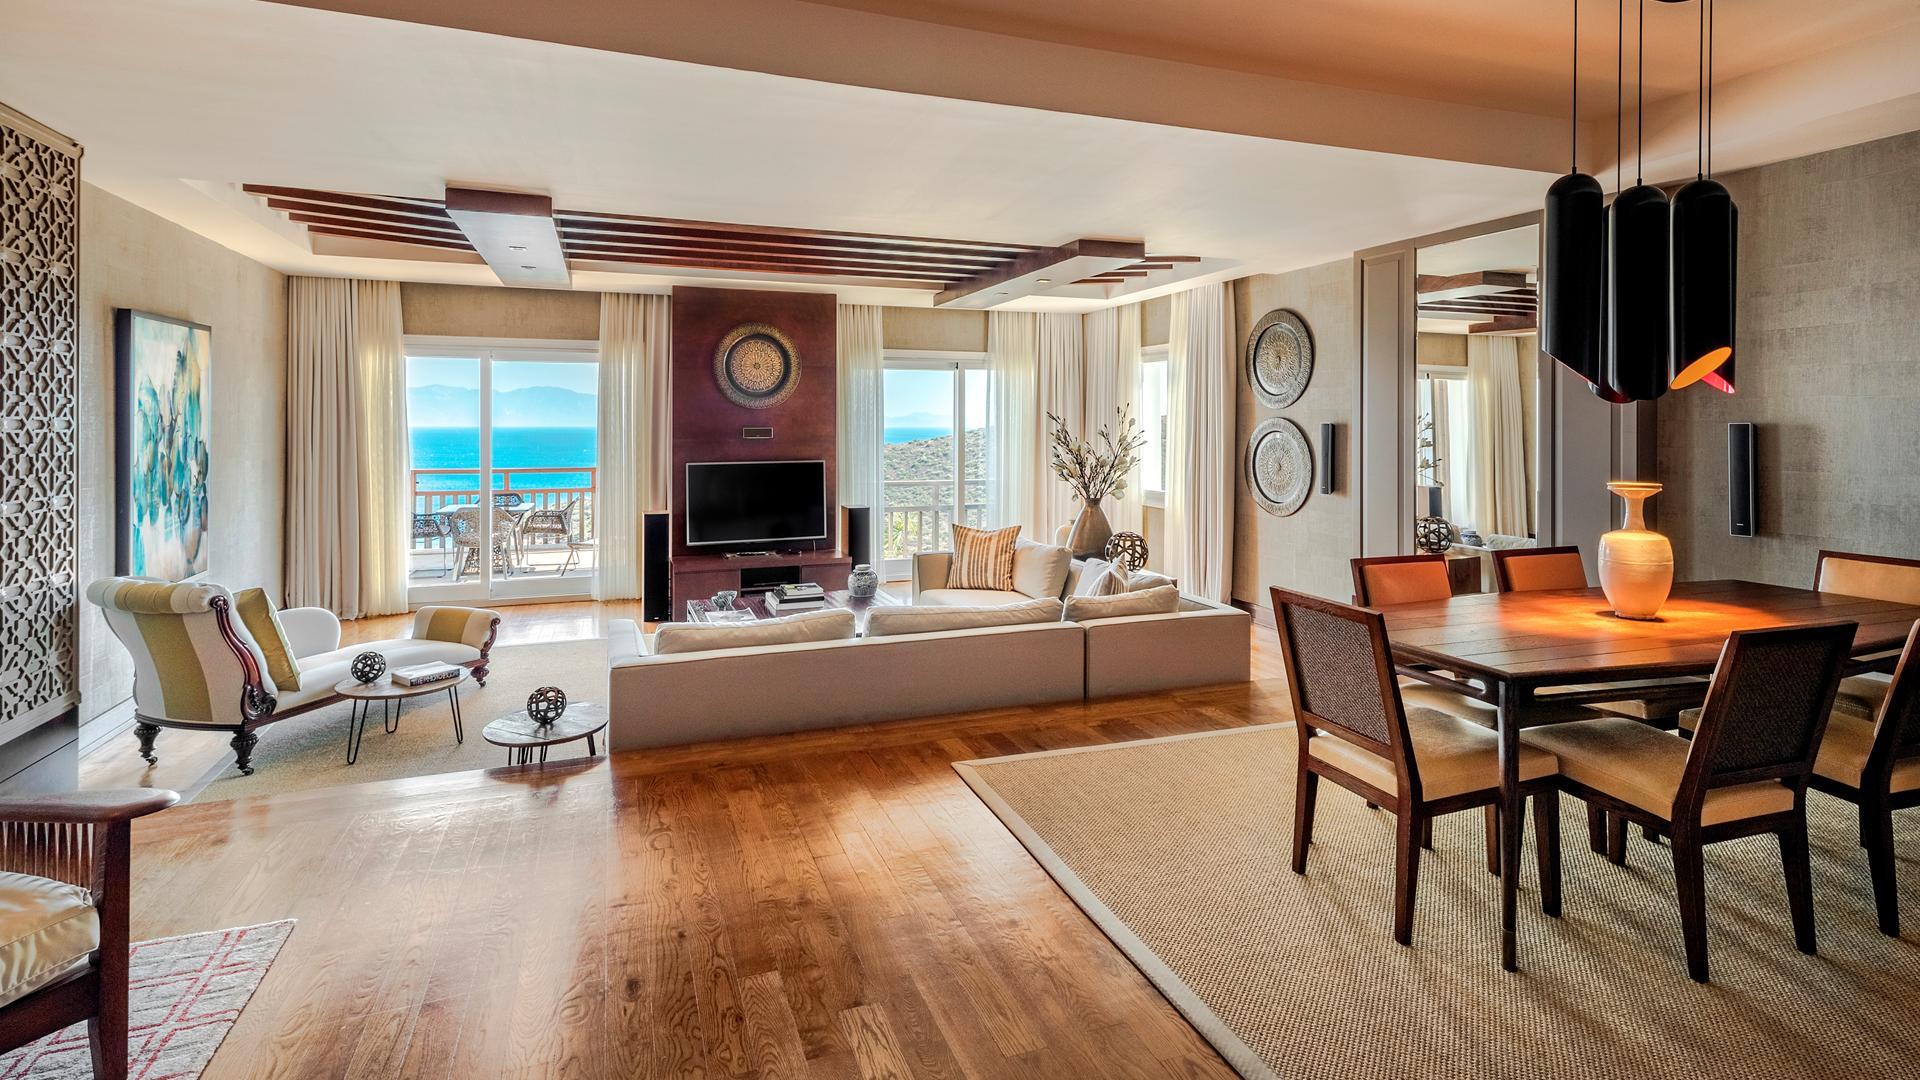 Kempinski Bodrum Barbaros Bay - Presidential Suite